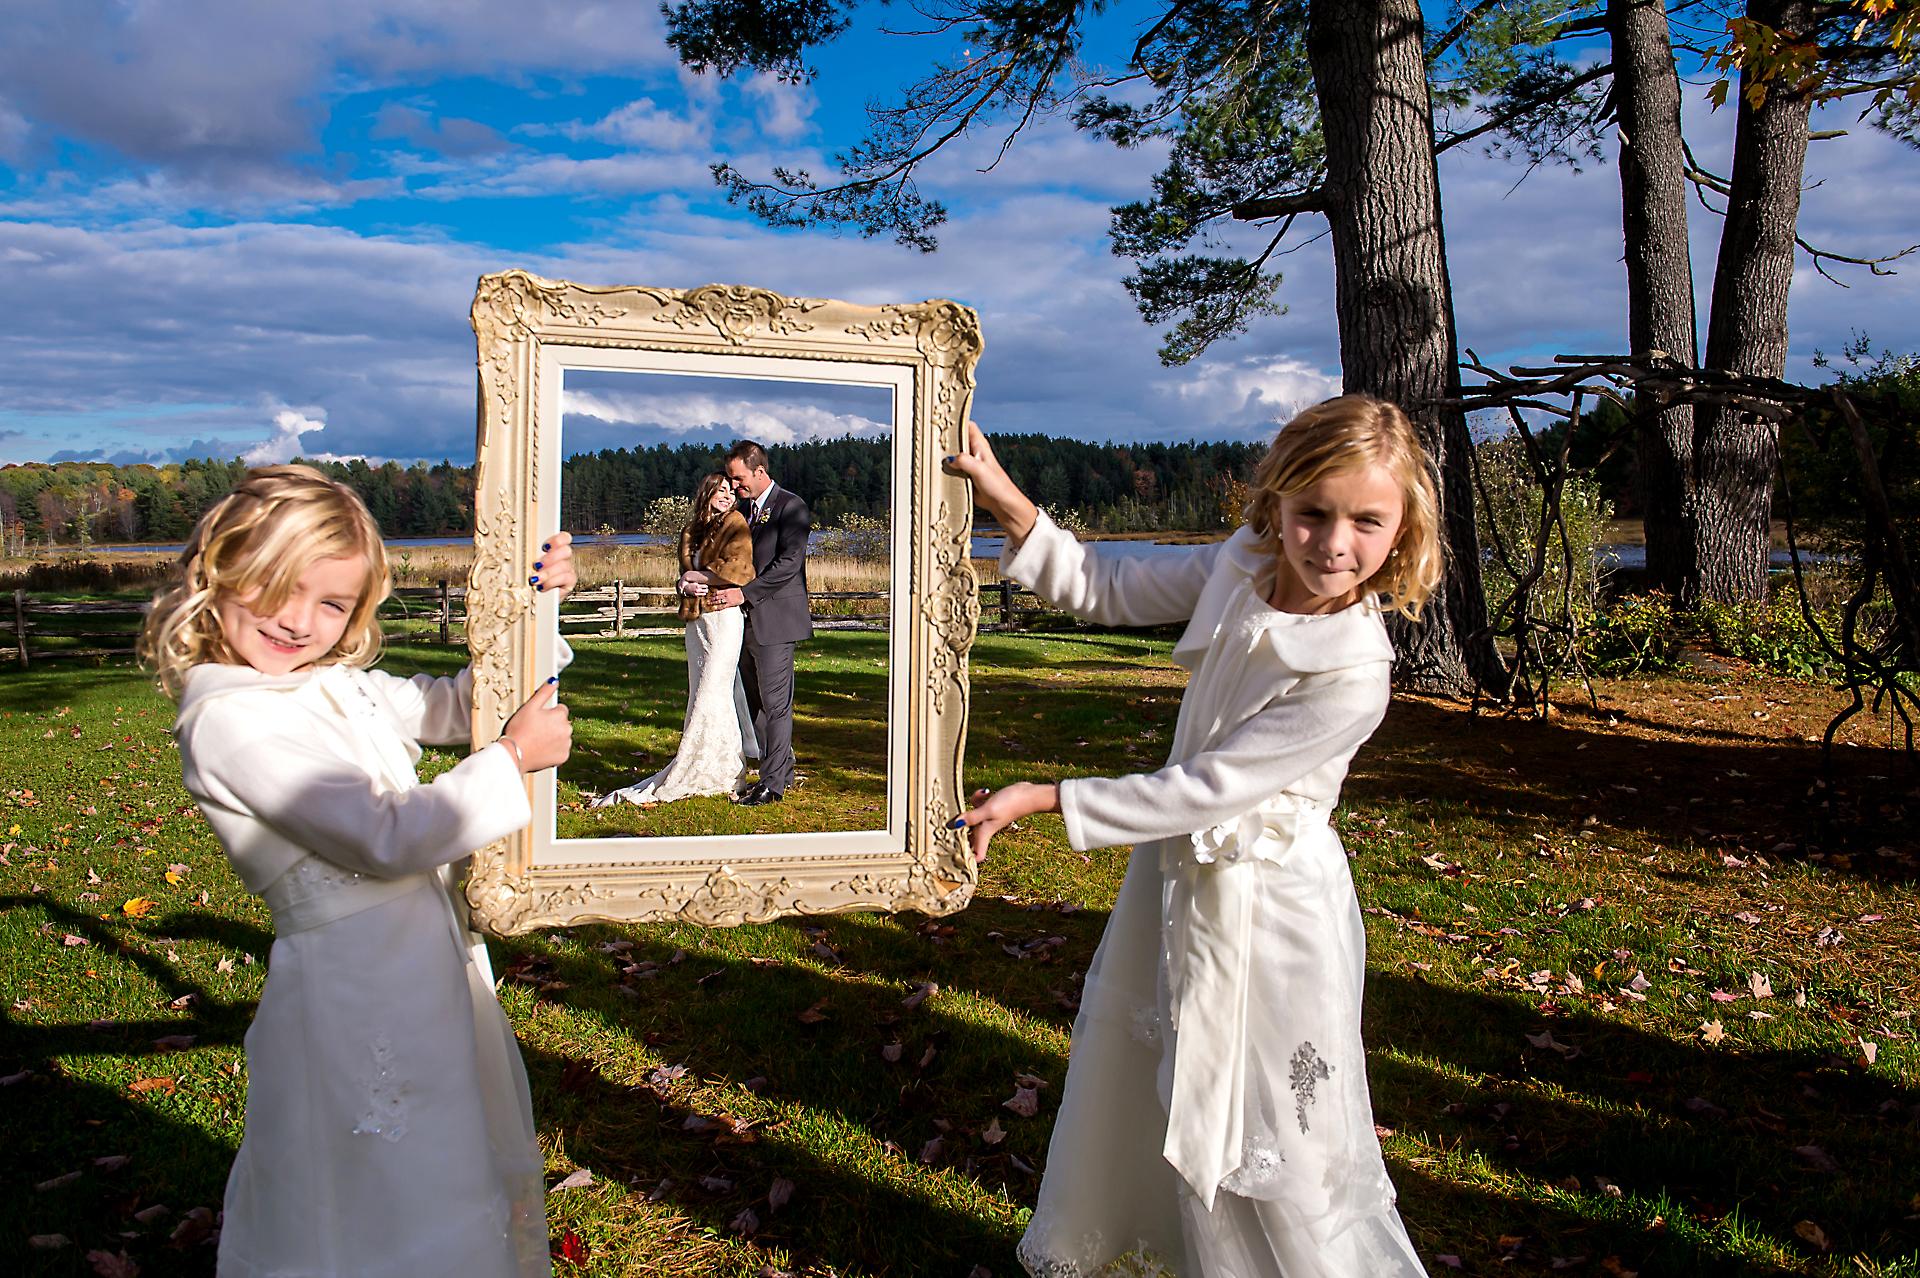 Nathan & Linda | Brooksfield Farms Wedding | Muskoka Wedding Photography26